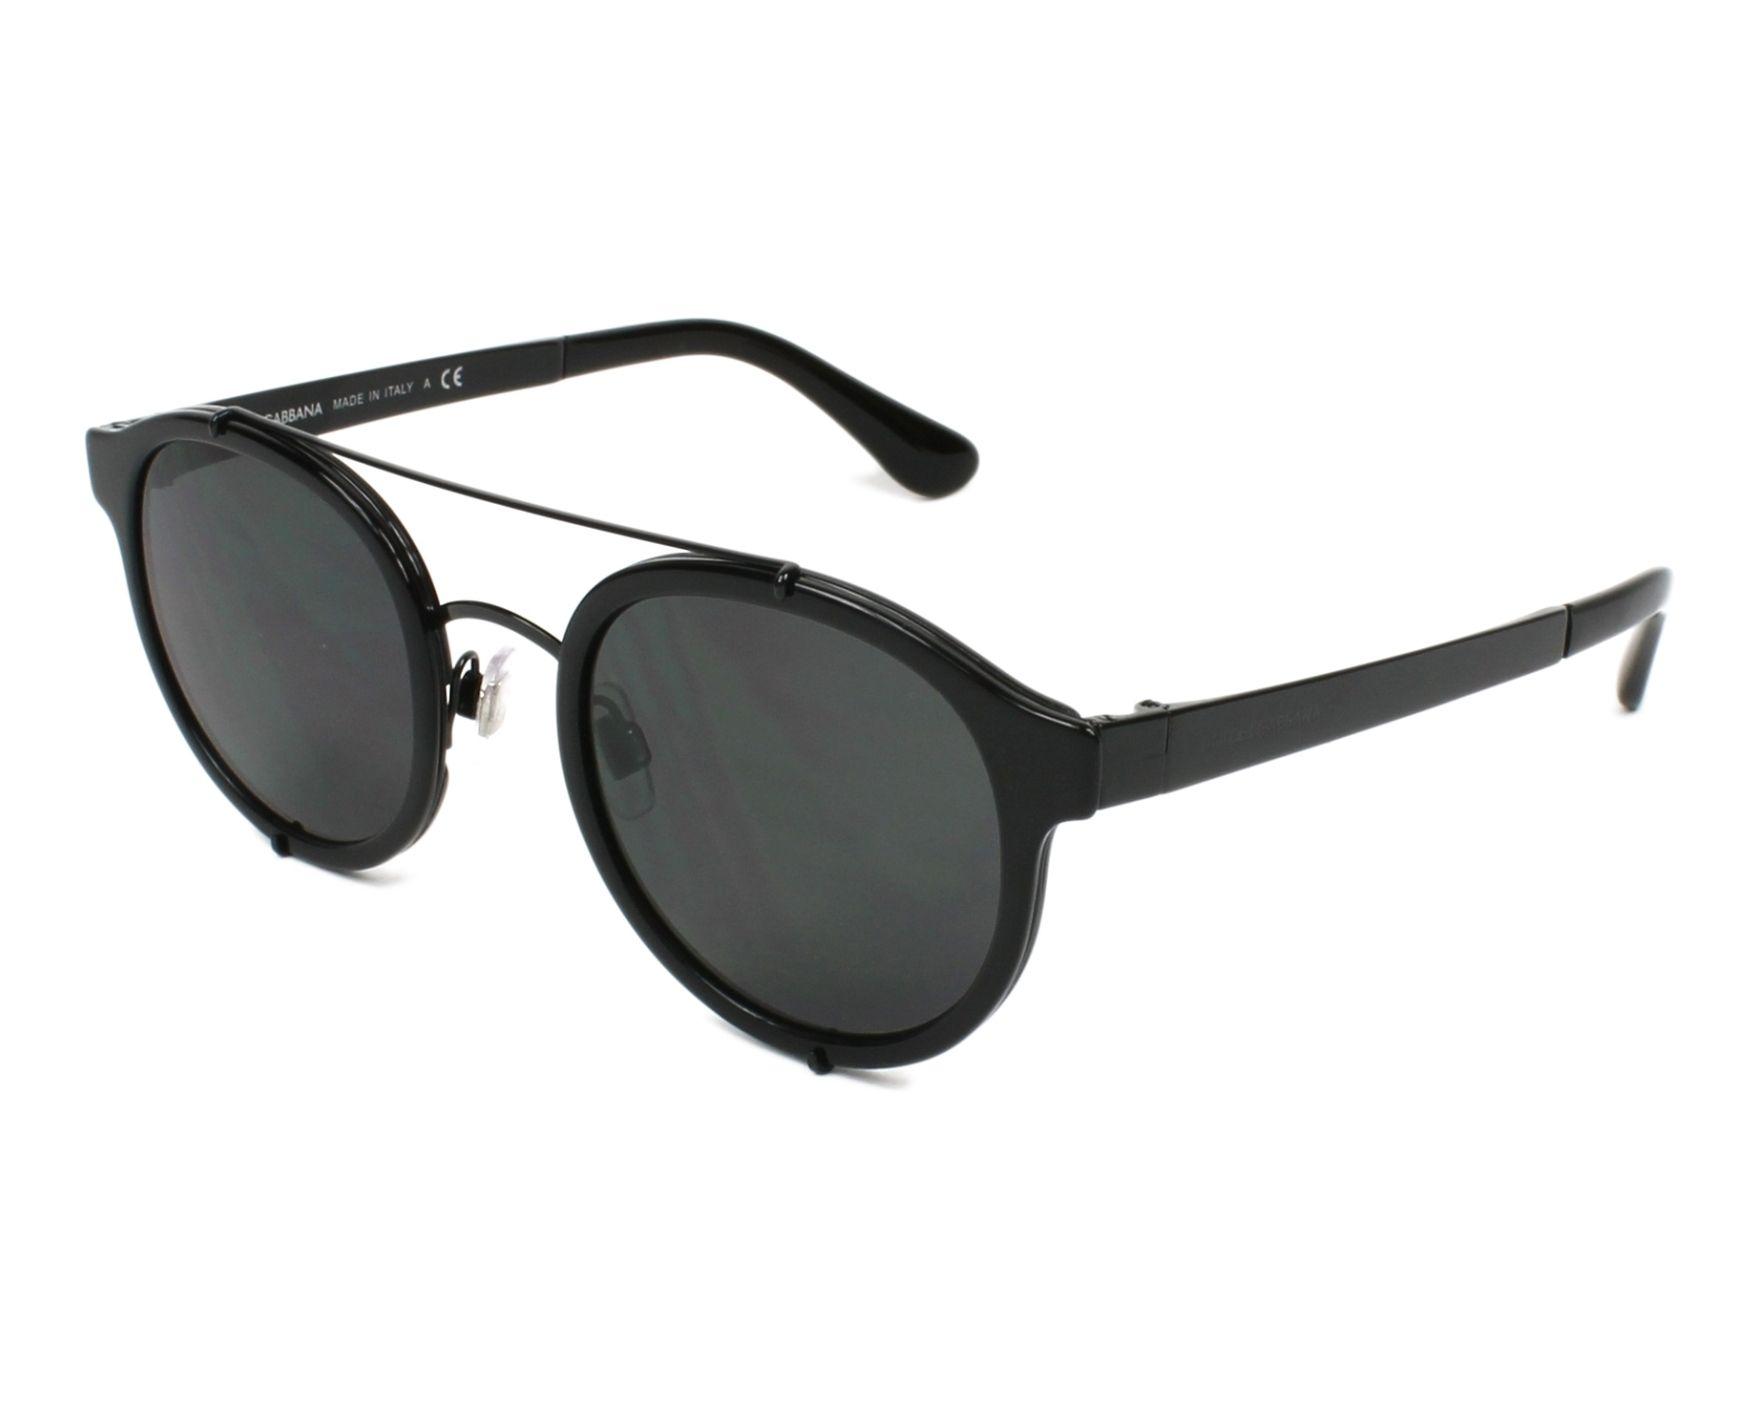 Dolce & Gabbana Sunglasses Black with Grey Lenses DG-2184 5001/87 ...